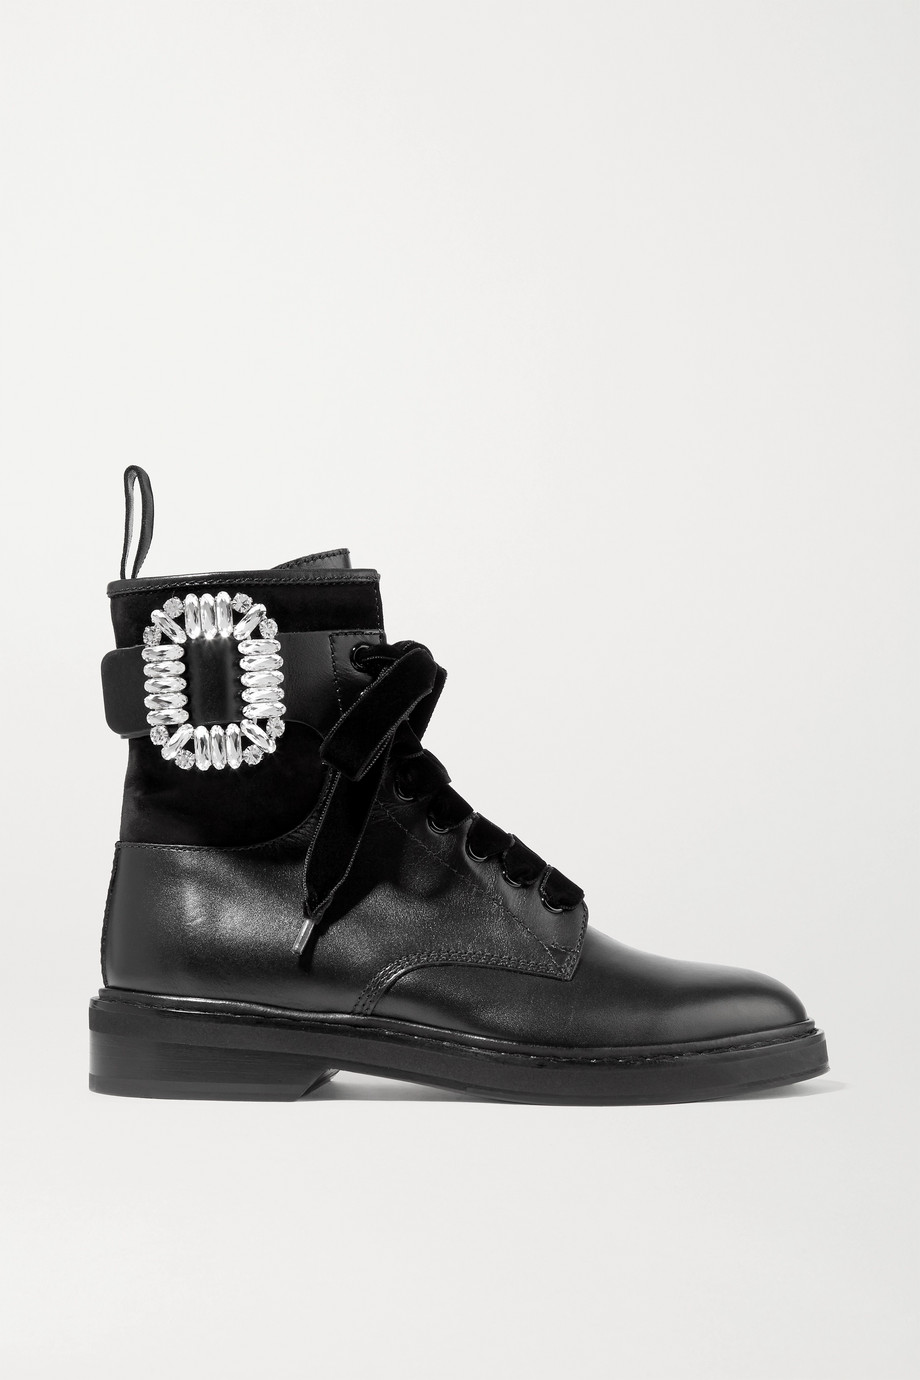 Roger Vivier Viv Rangers crystal-embellished paneled leather and suede ankle boots